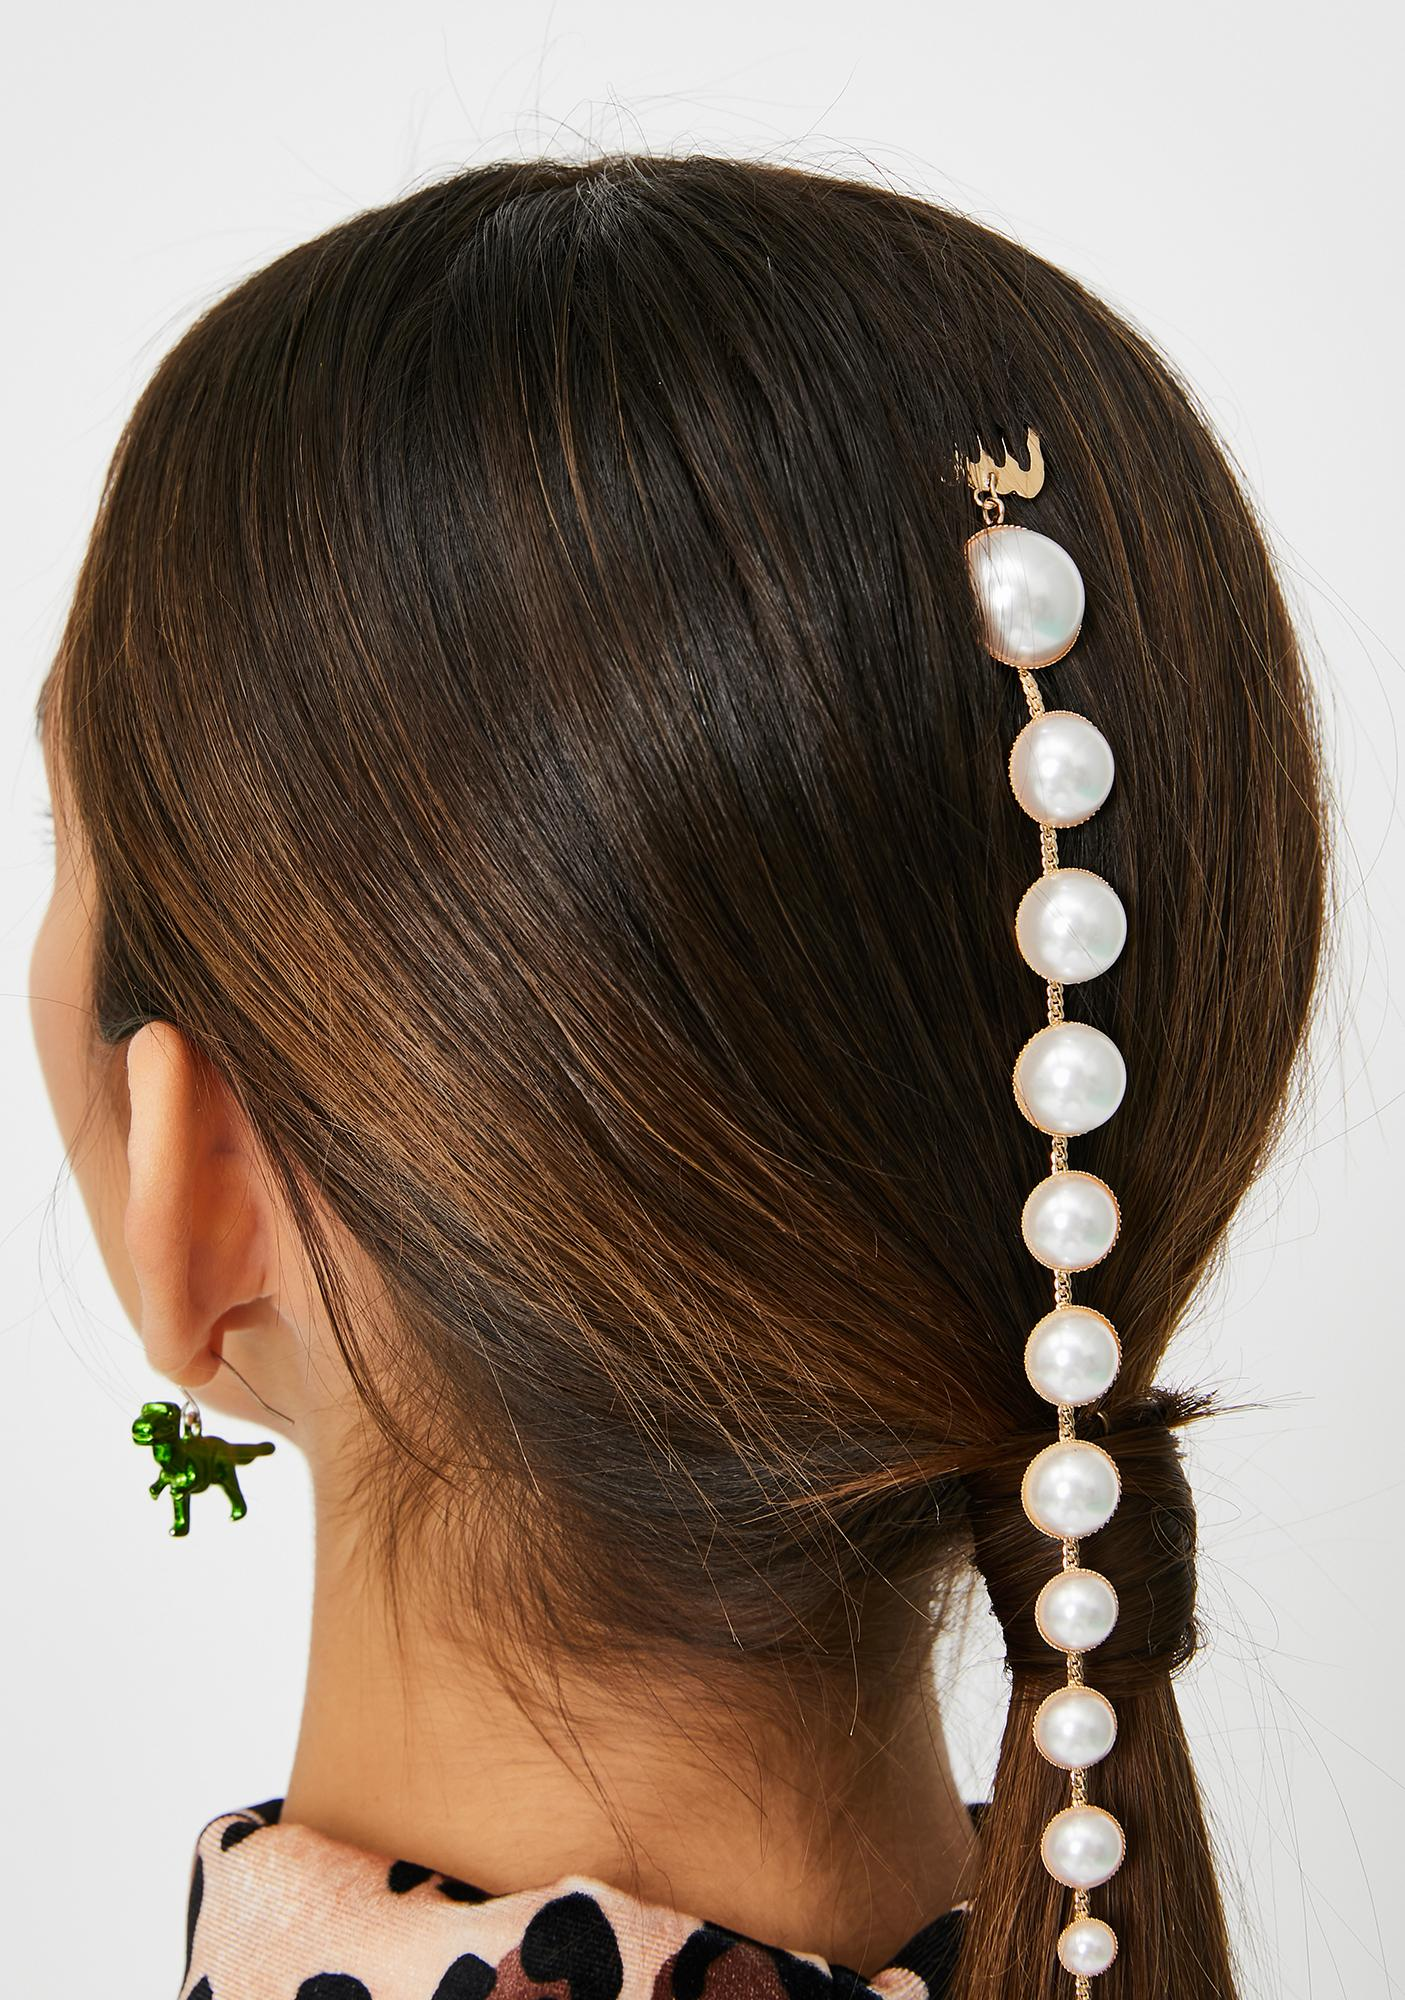 Enchanted Oceans Pearl Hair Extension